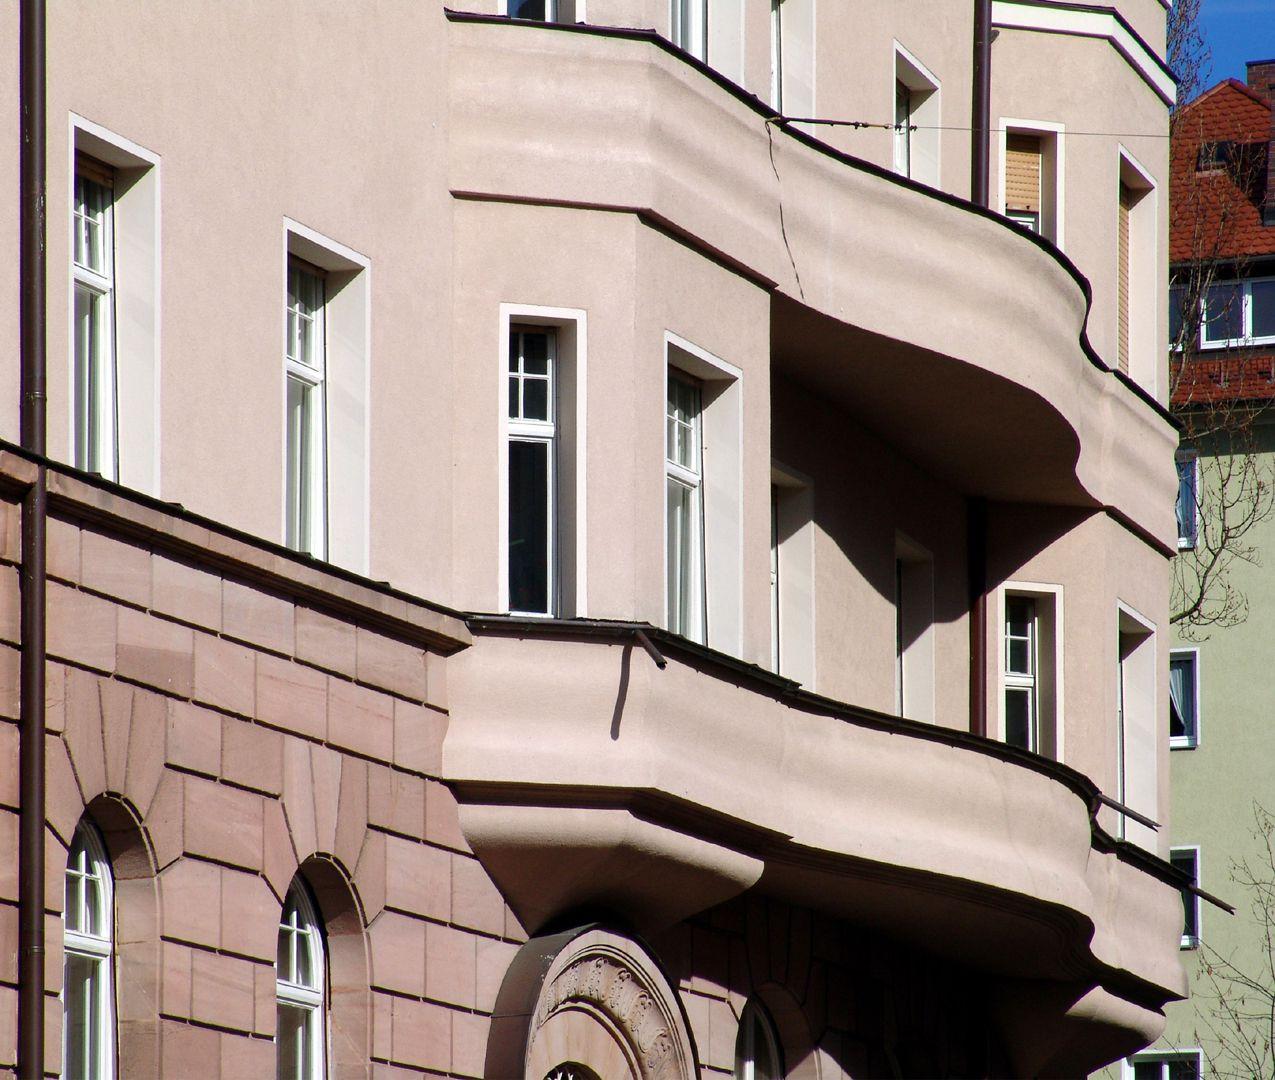 Residential house, Burgschmietstraße 12 Curved balconies